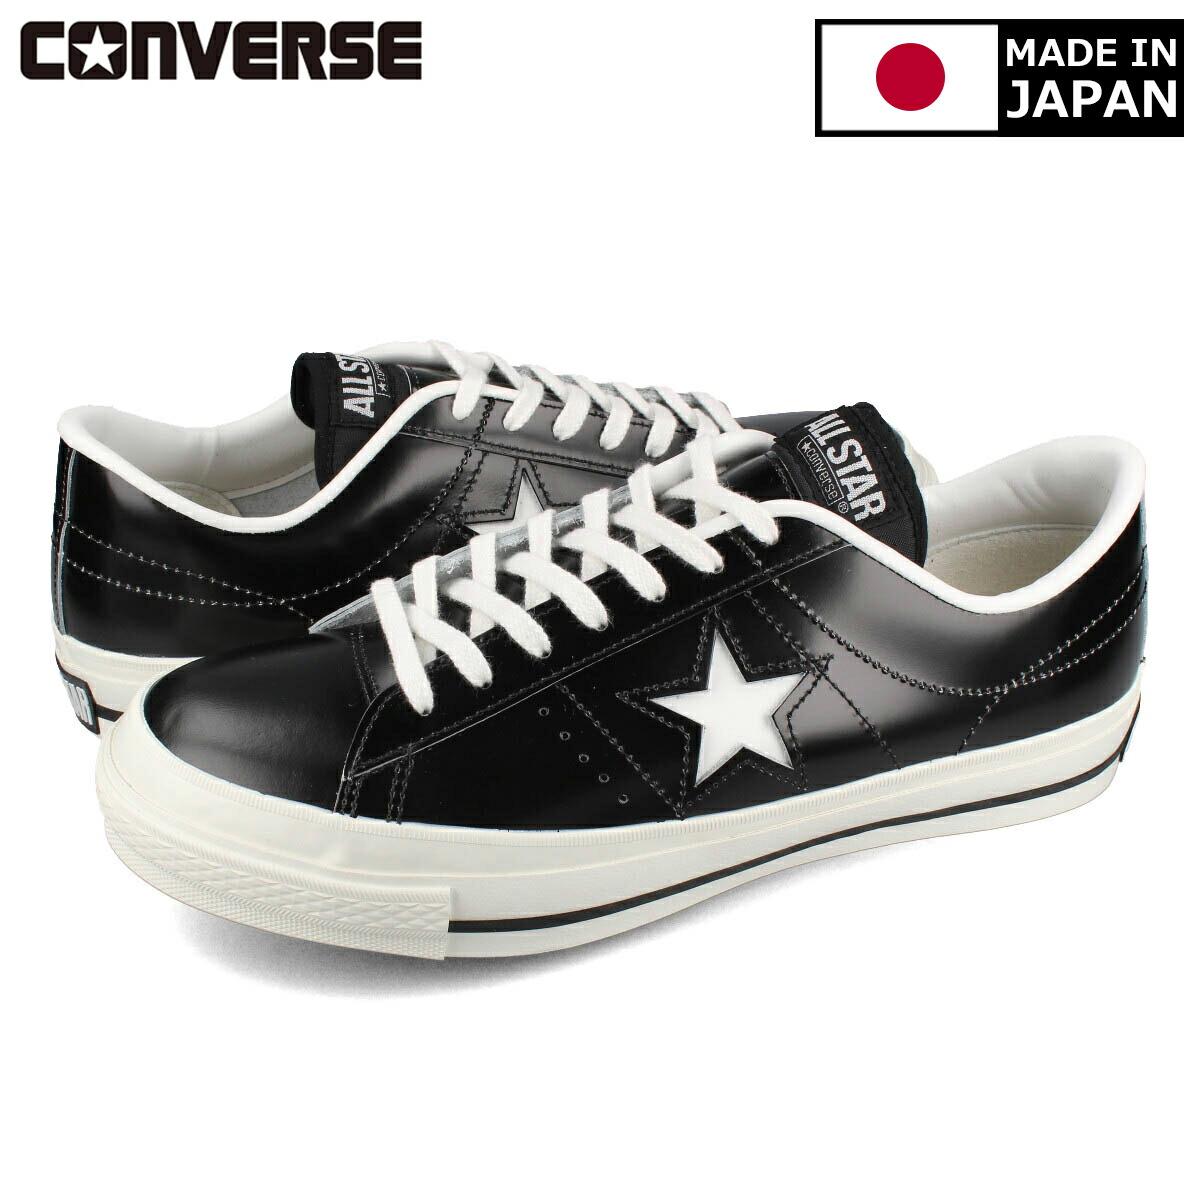 7a1776cc9e converse shoes price list